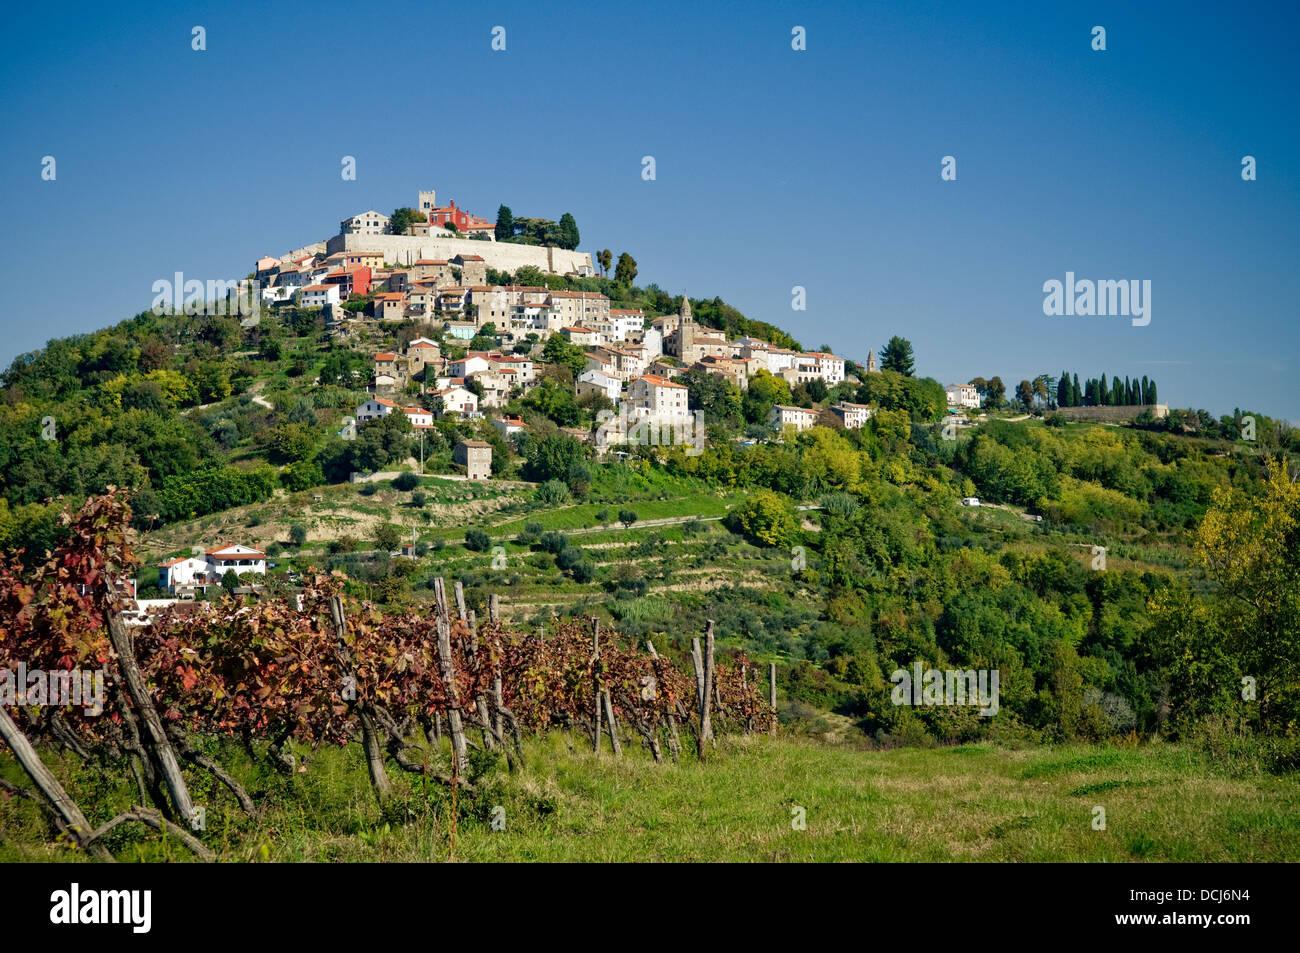 Old medieval town of Motovun. Croatia. Stock Photo